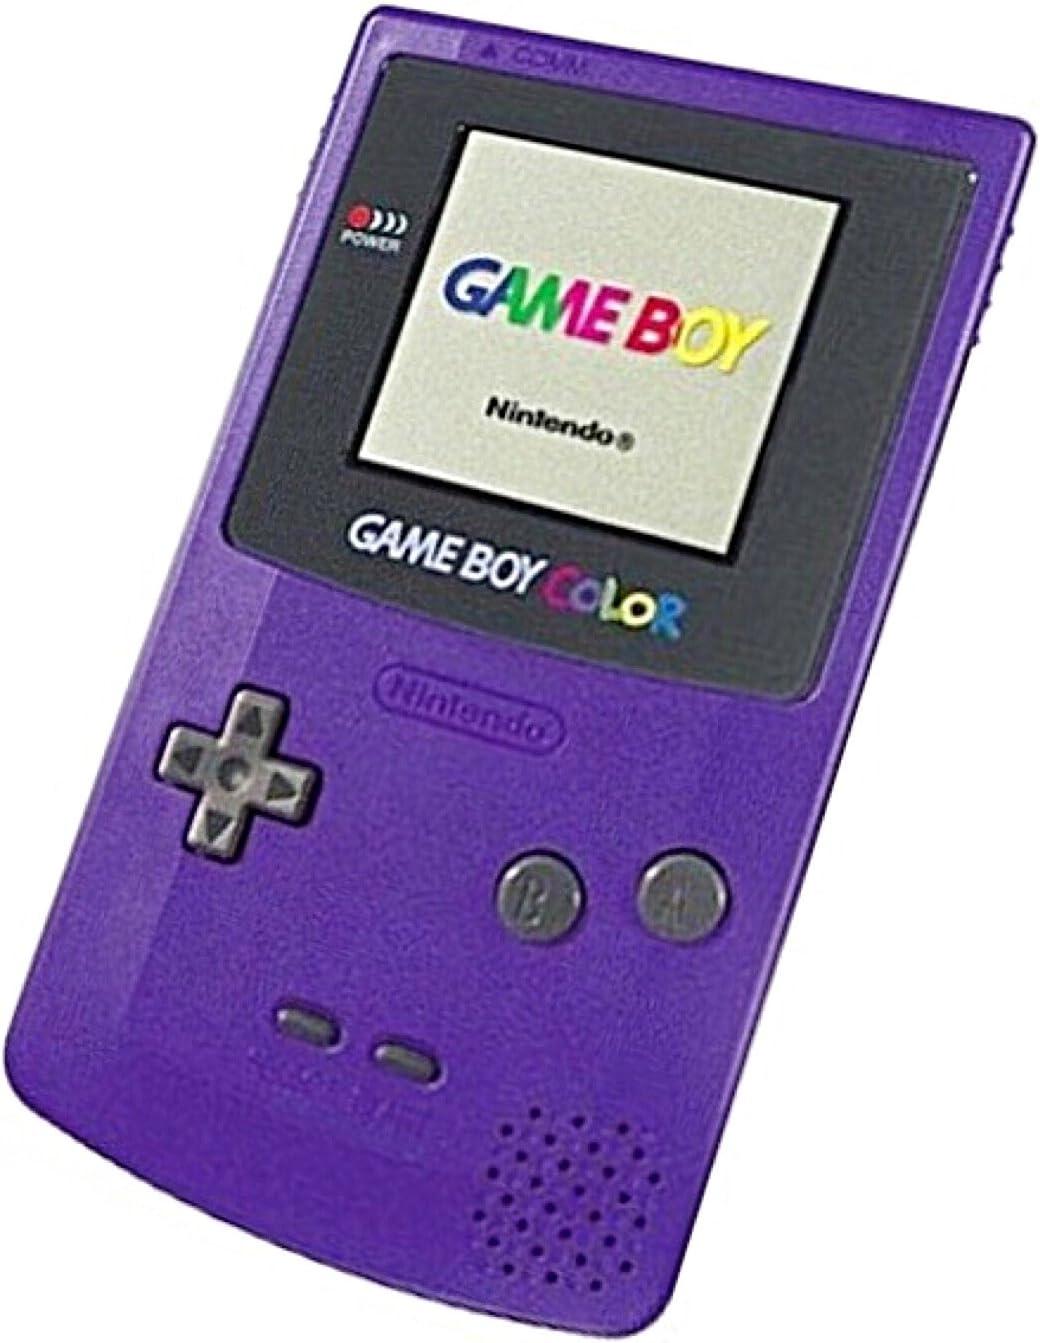 Game boy color - Game Boy Color Grape